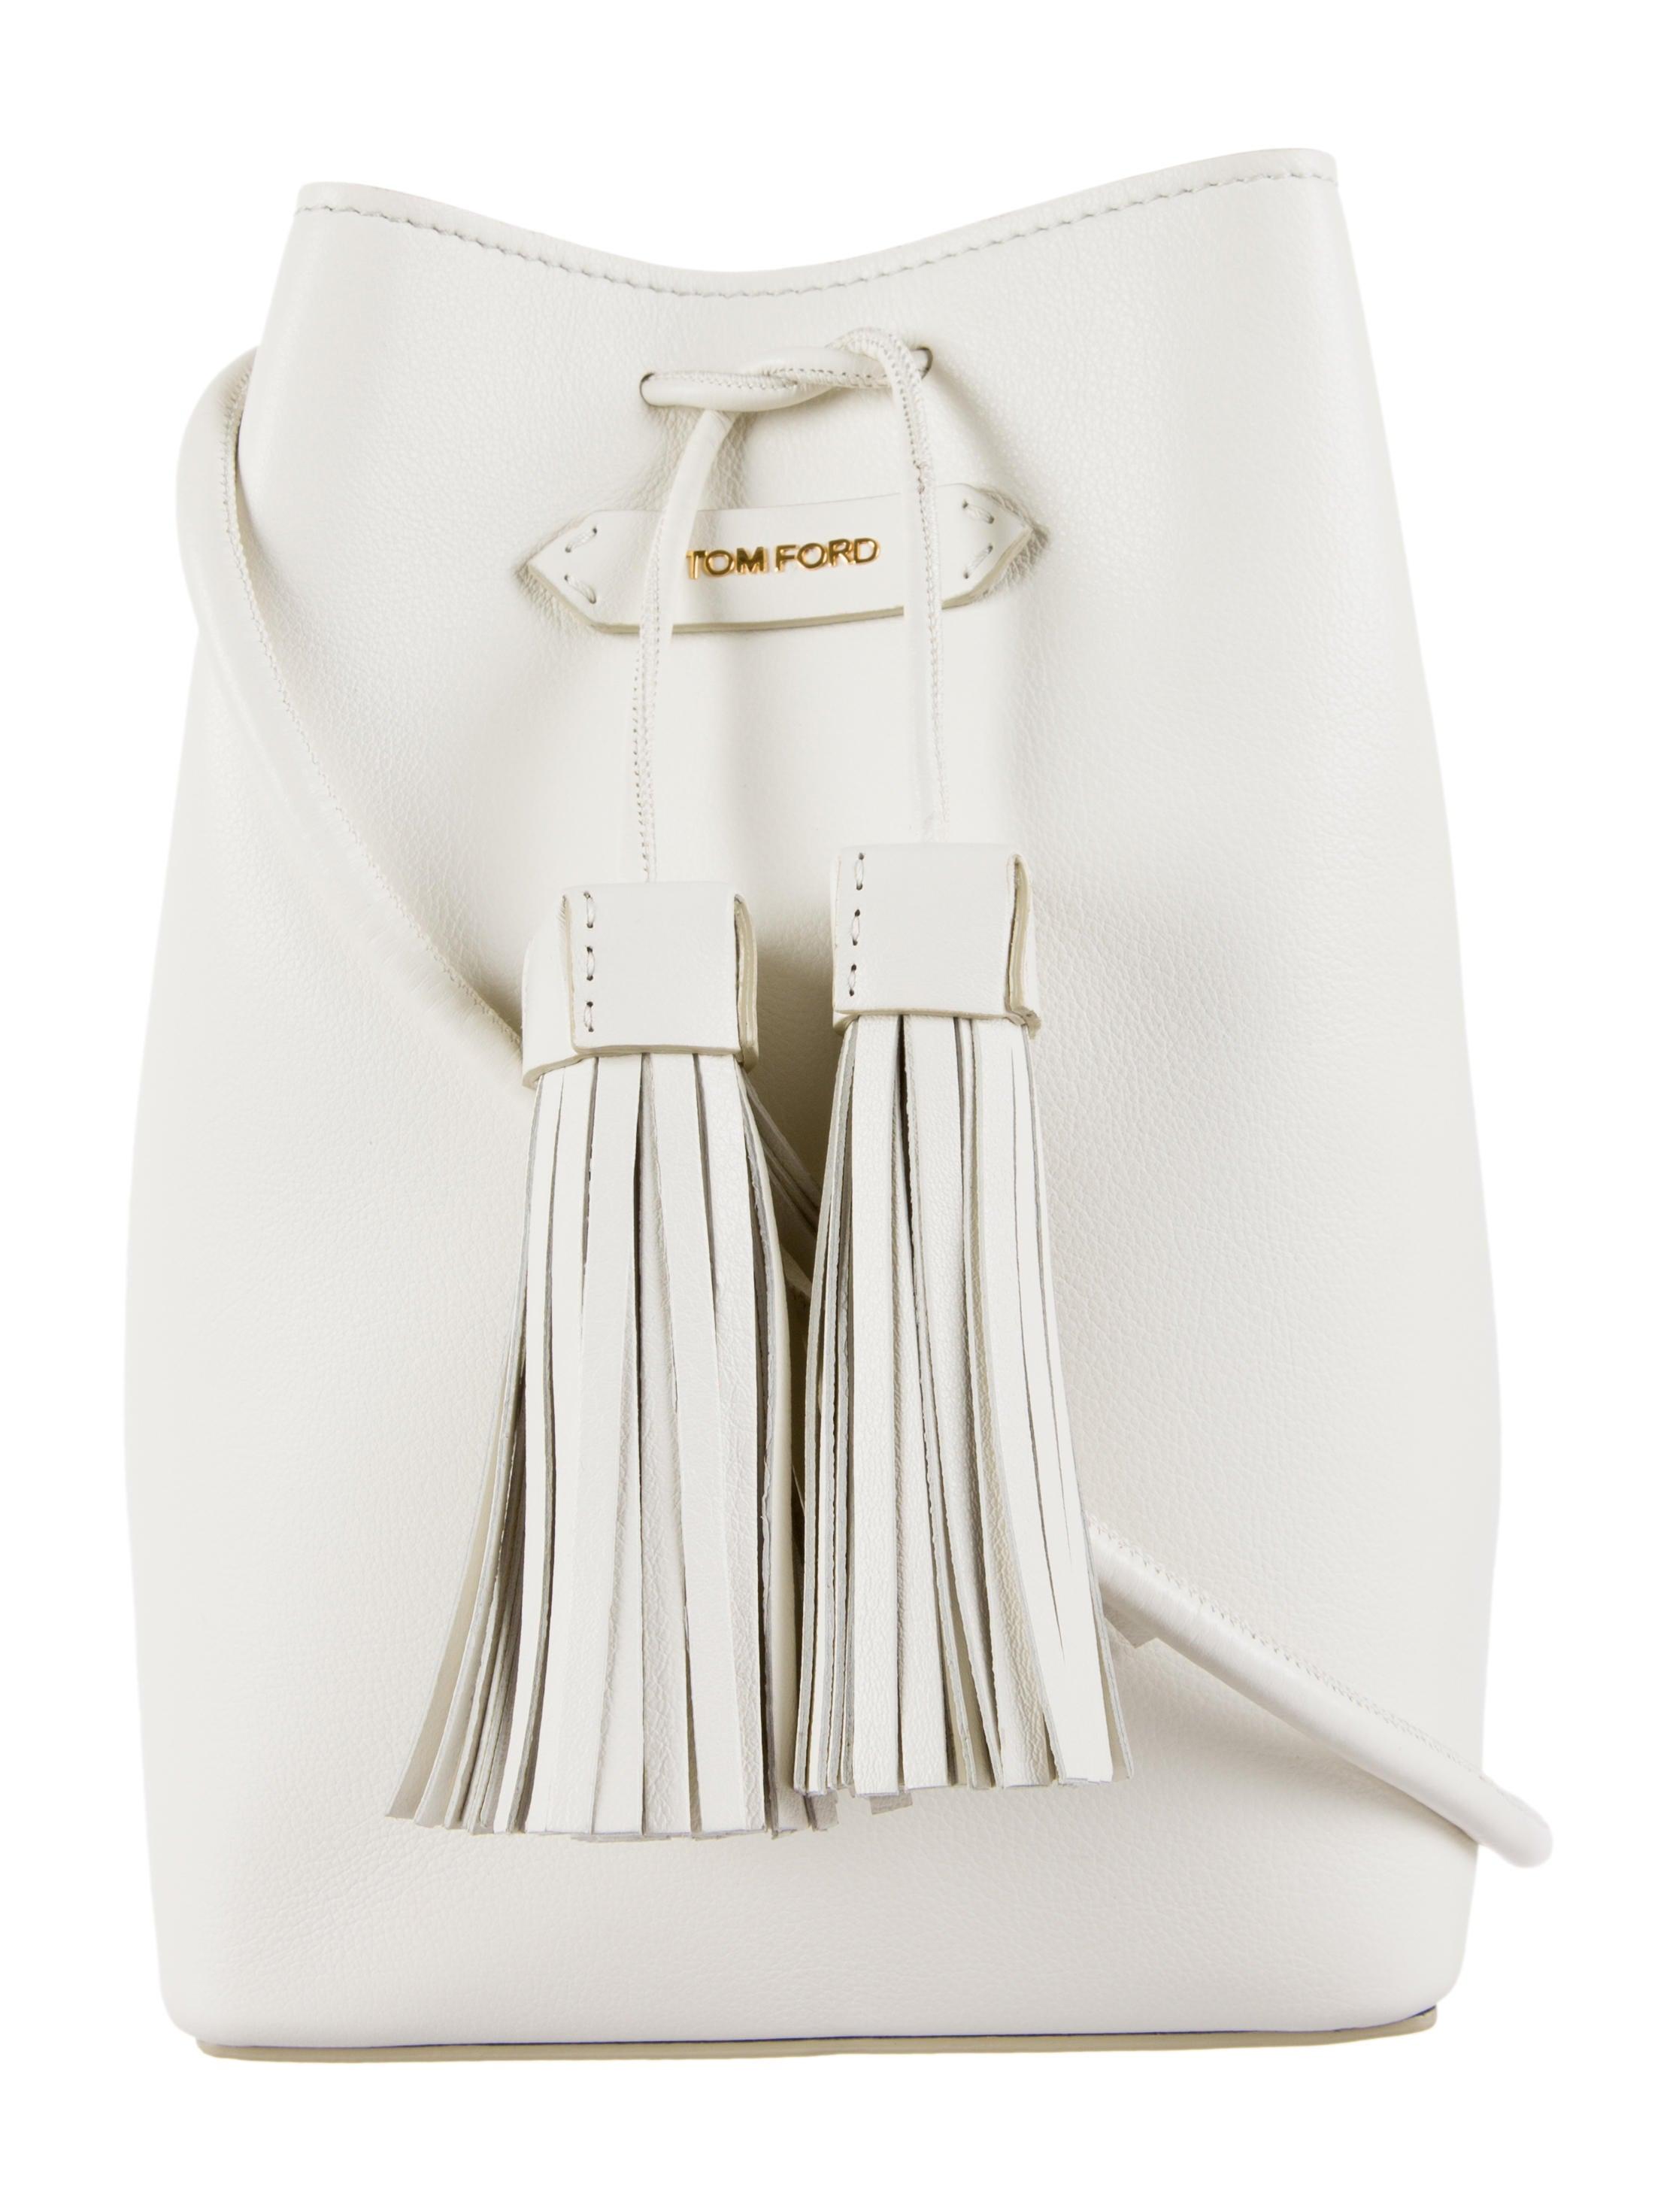 Tom Ford Small Tassel Bucket Bag - Handbags - TOM25283   The RealReal 33297f8f564c